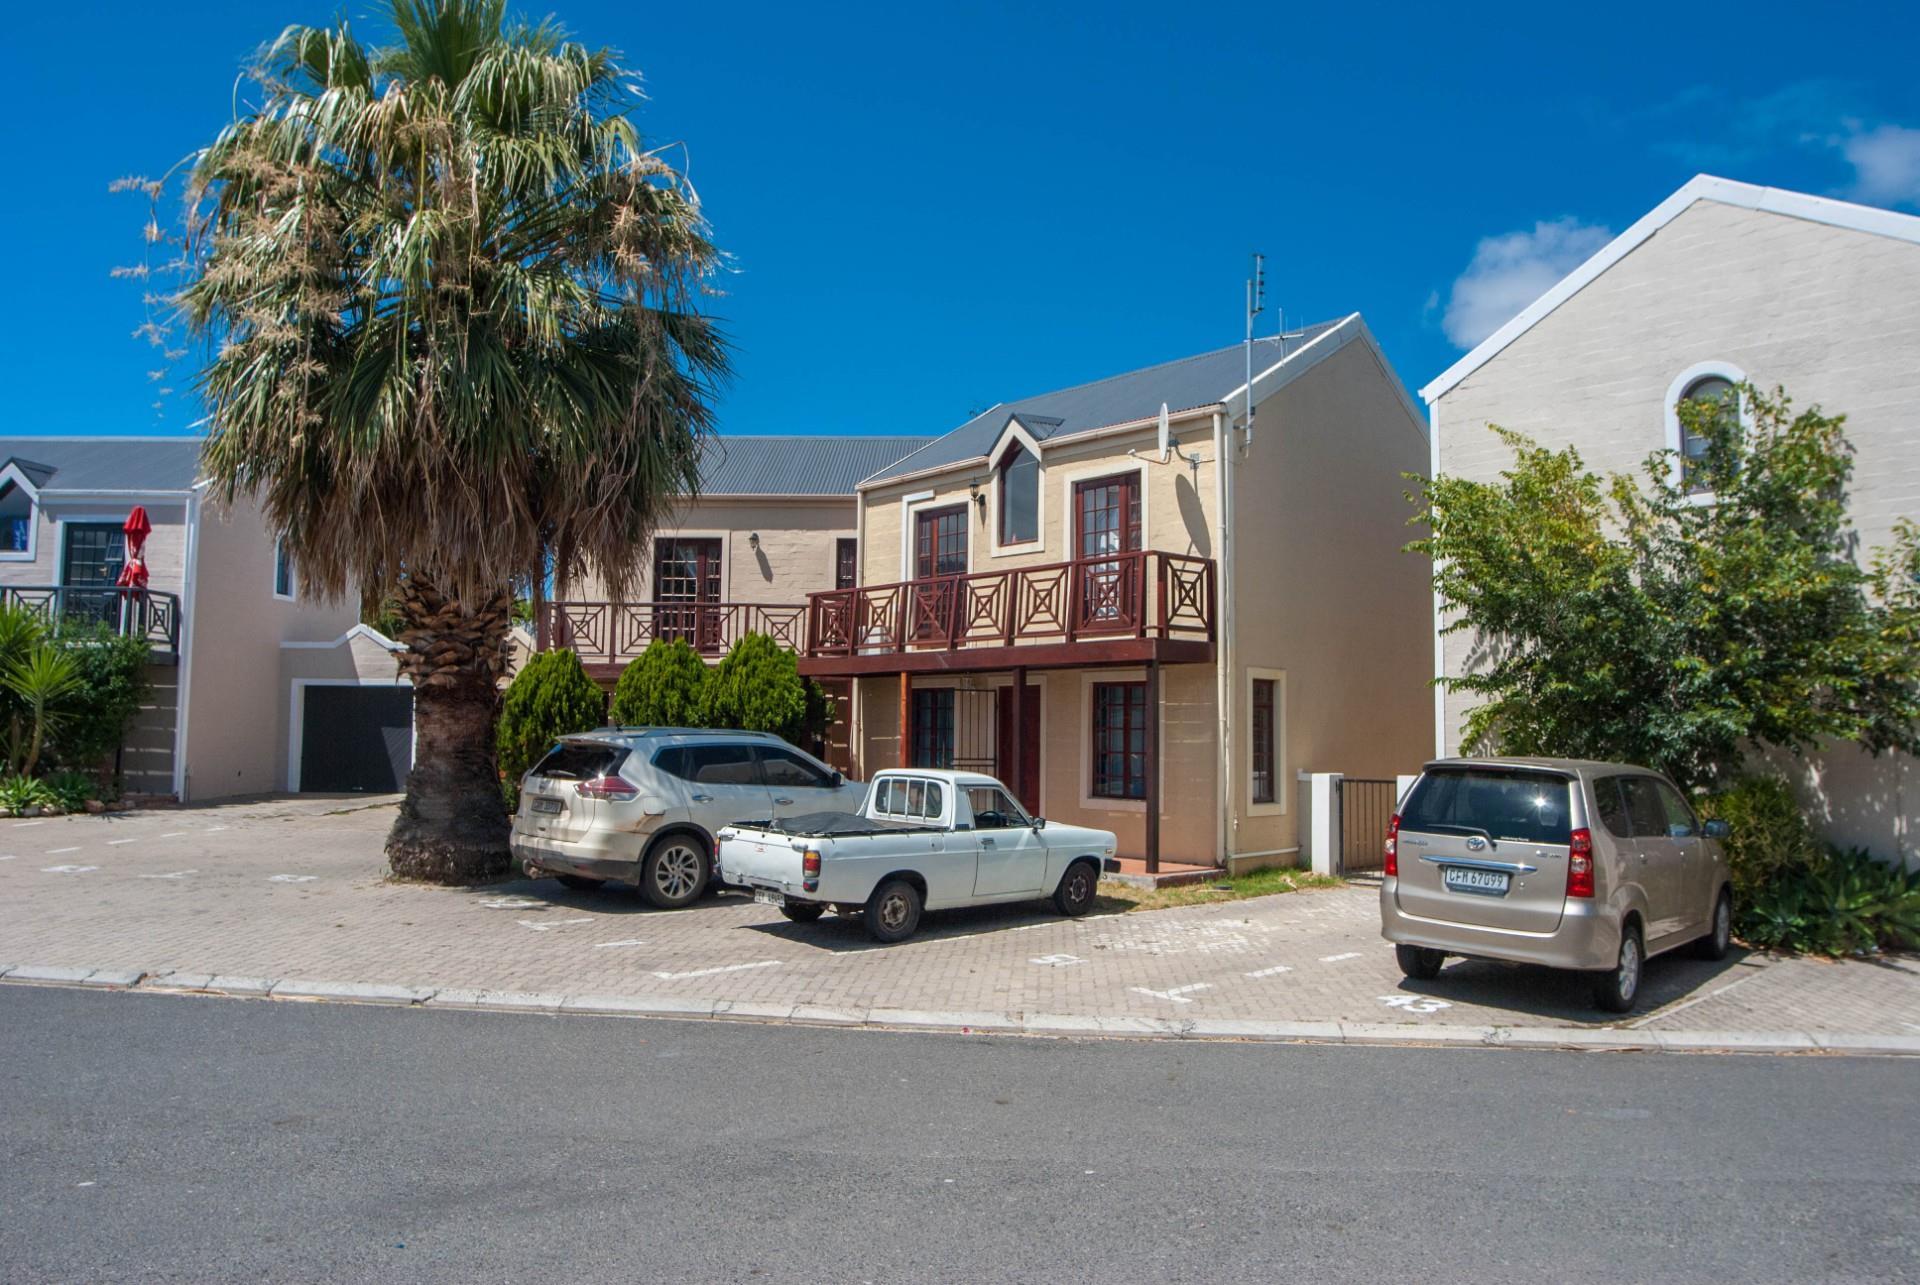 2 Bedroom Townhouse To Rent in Heritage Park